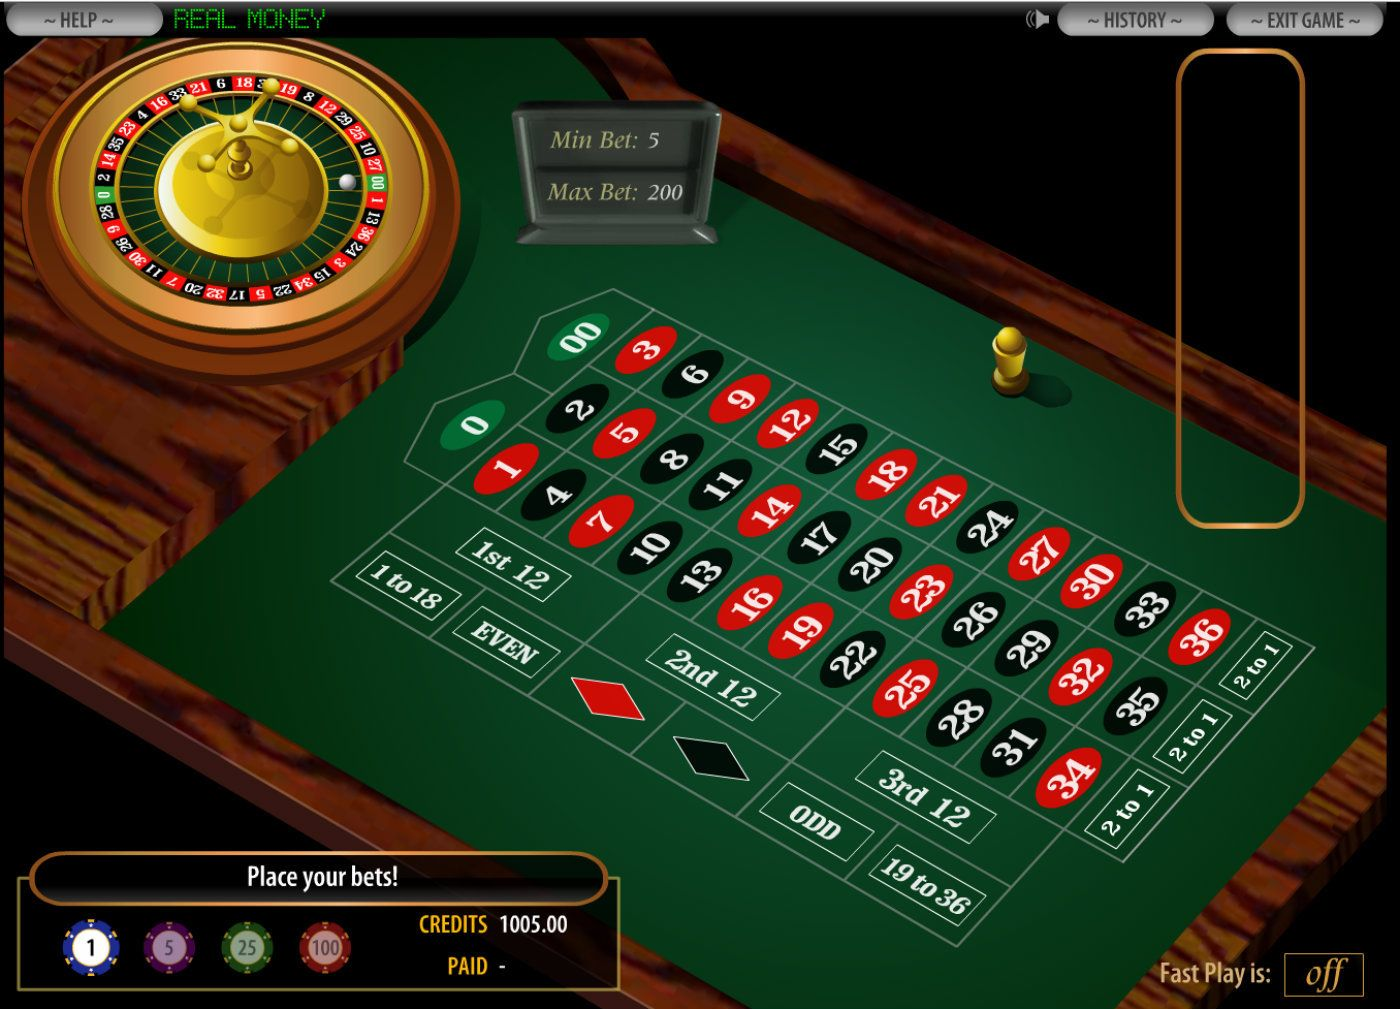 Red gaming slots - 63049